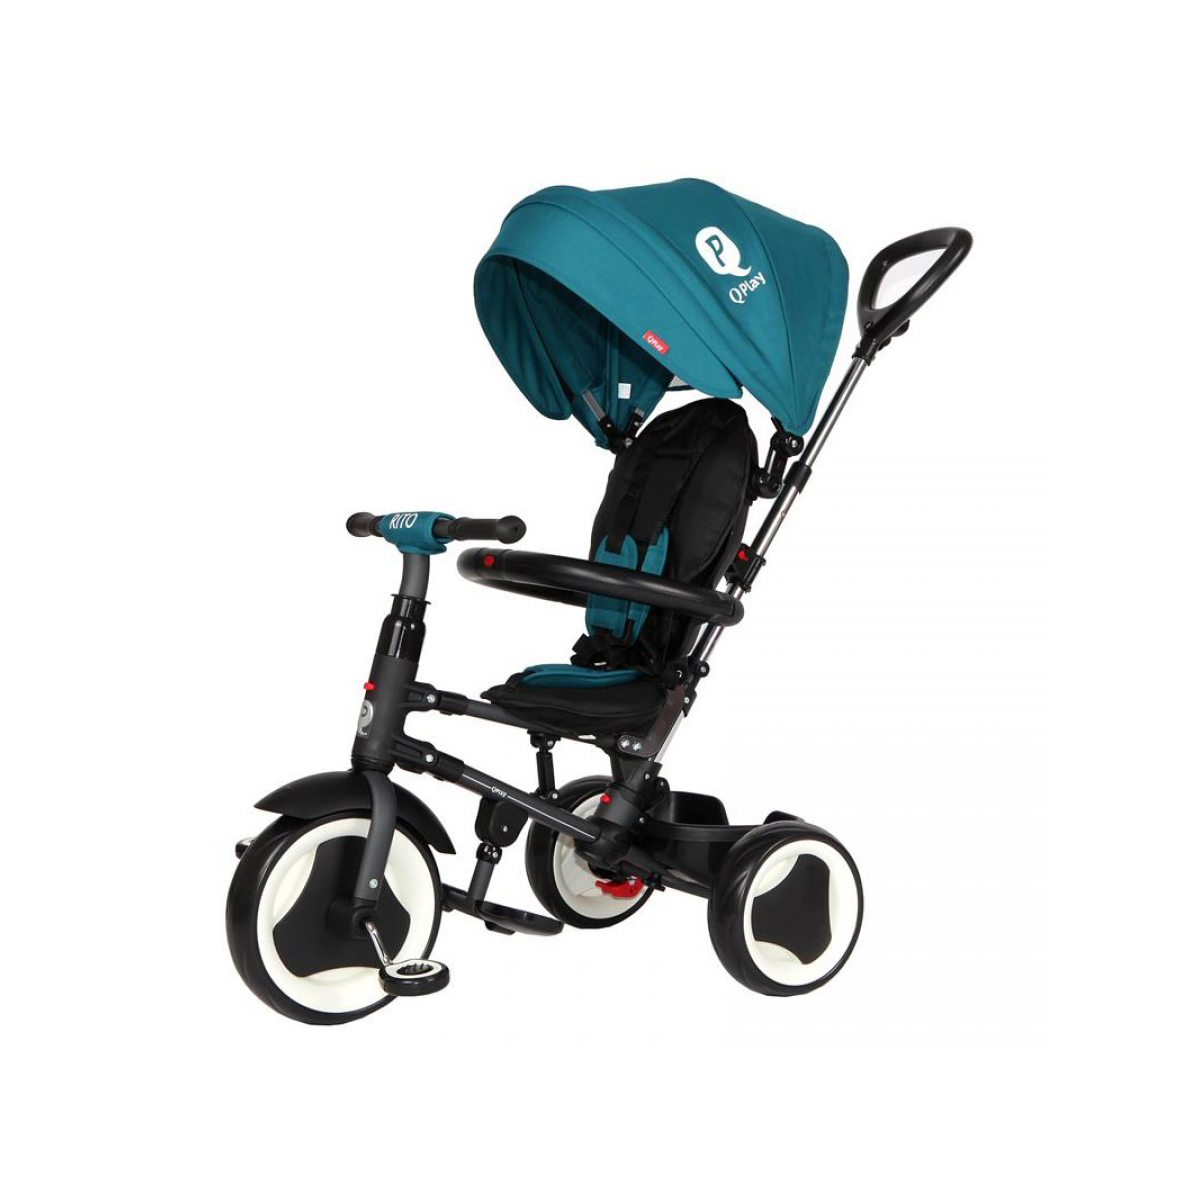 Qplay tricikl Rito green blue